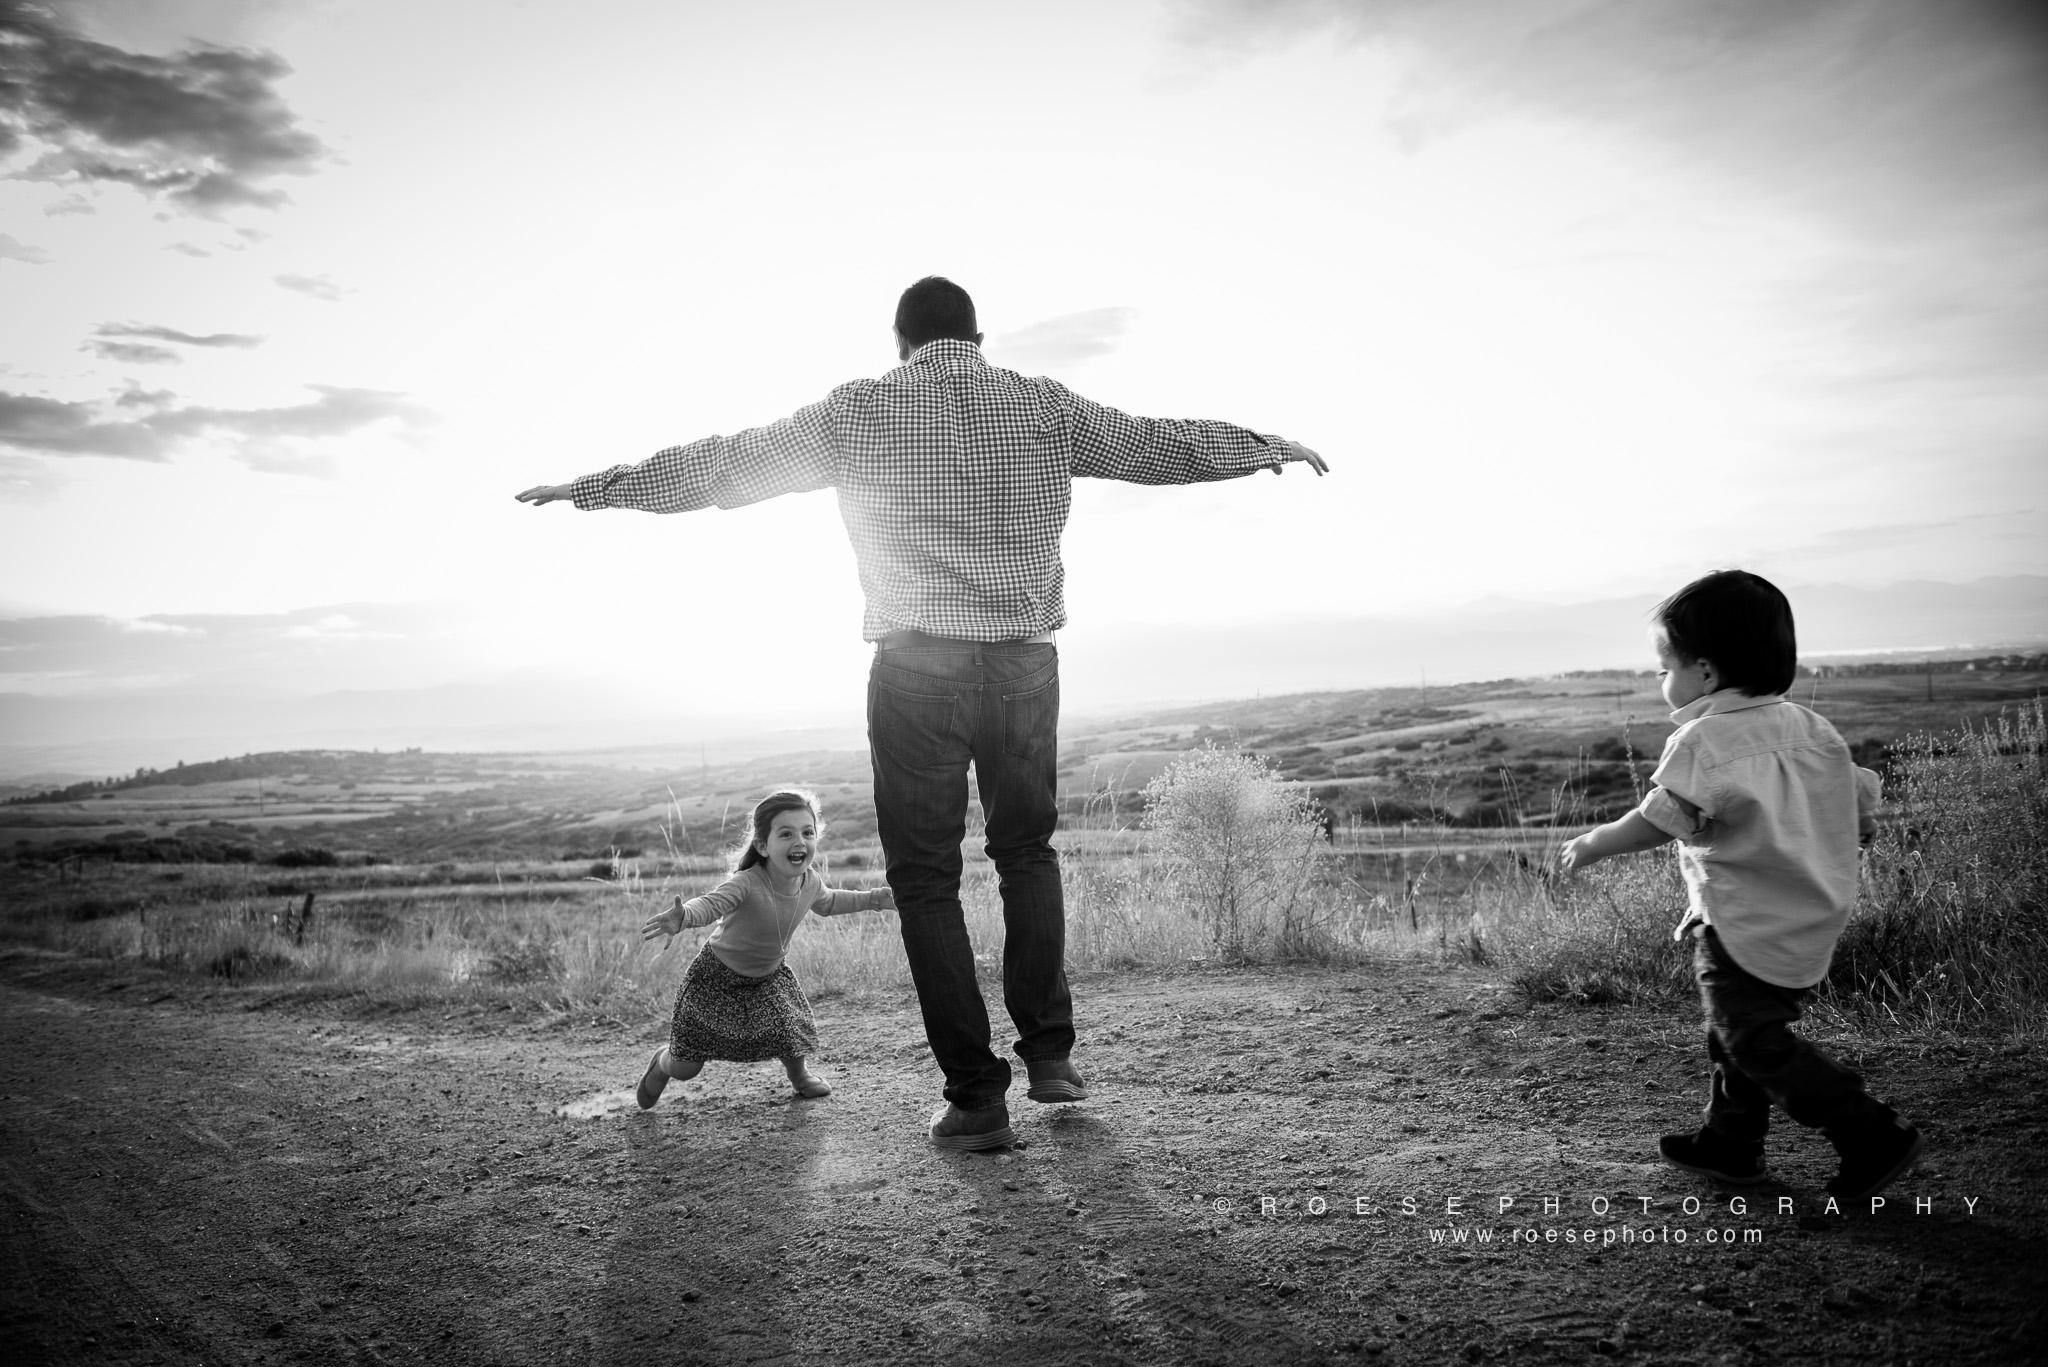 C.-Roese-Ramp-Roese-Photography-LLC.-Bennett-Family-13.jpg